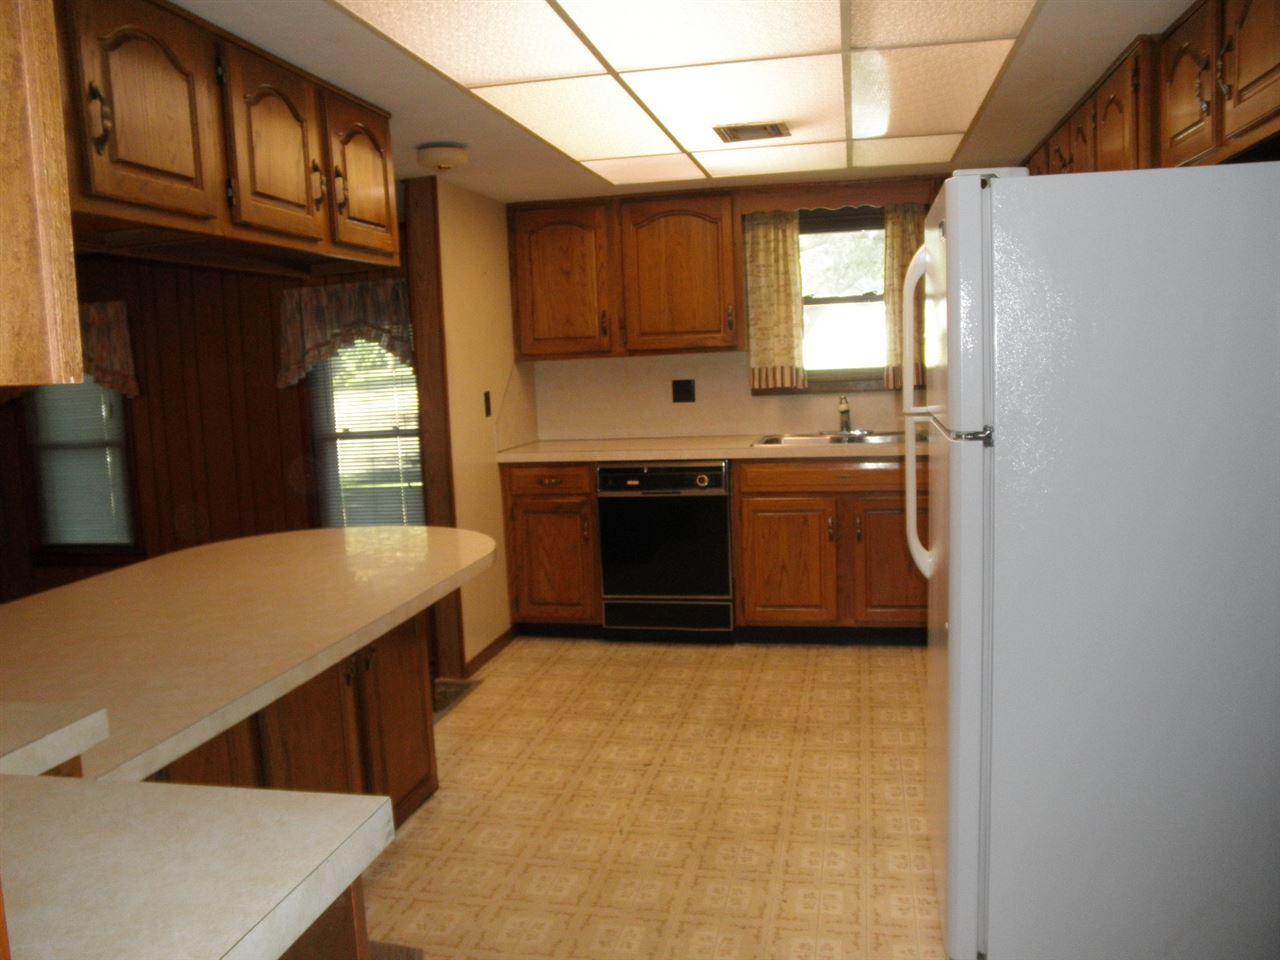 Sold Cross Sale W/ MLS | 916 E Cherry Ponca City, OK 74601 7